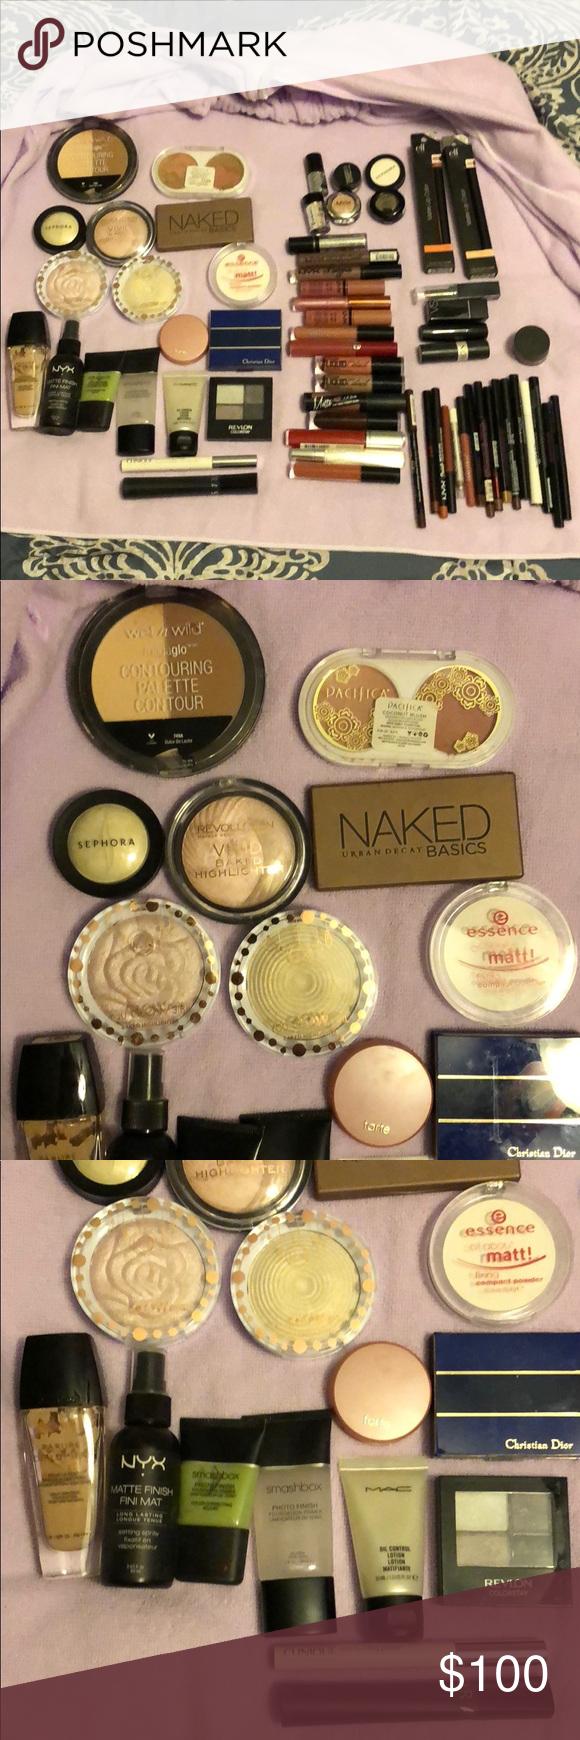 62pc Makeup lot Dior Sephora NYX Armani Naked I have a makeup lot 62pieces: 6 eyeliners, 10 lipliners, 2 wet eyeliners, 20 lipsticks (georgio armani, nyx, lancome, dior, nyx, vs), lipstains and lipglosses, 6 eyeshadows and 2 eyeshadow palettes (urban decay naked palette and revlon), 3 blush sets (dior, tarte, pacifica), 3 highlighters, 1 contour set, 1 matte powder, 1 guerlein liquid foundation in baige clair, 2 mascaras sephora, loreal, 1 clinique eyelash primer, 1 finishing spray, 2…